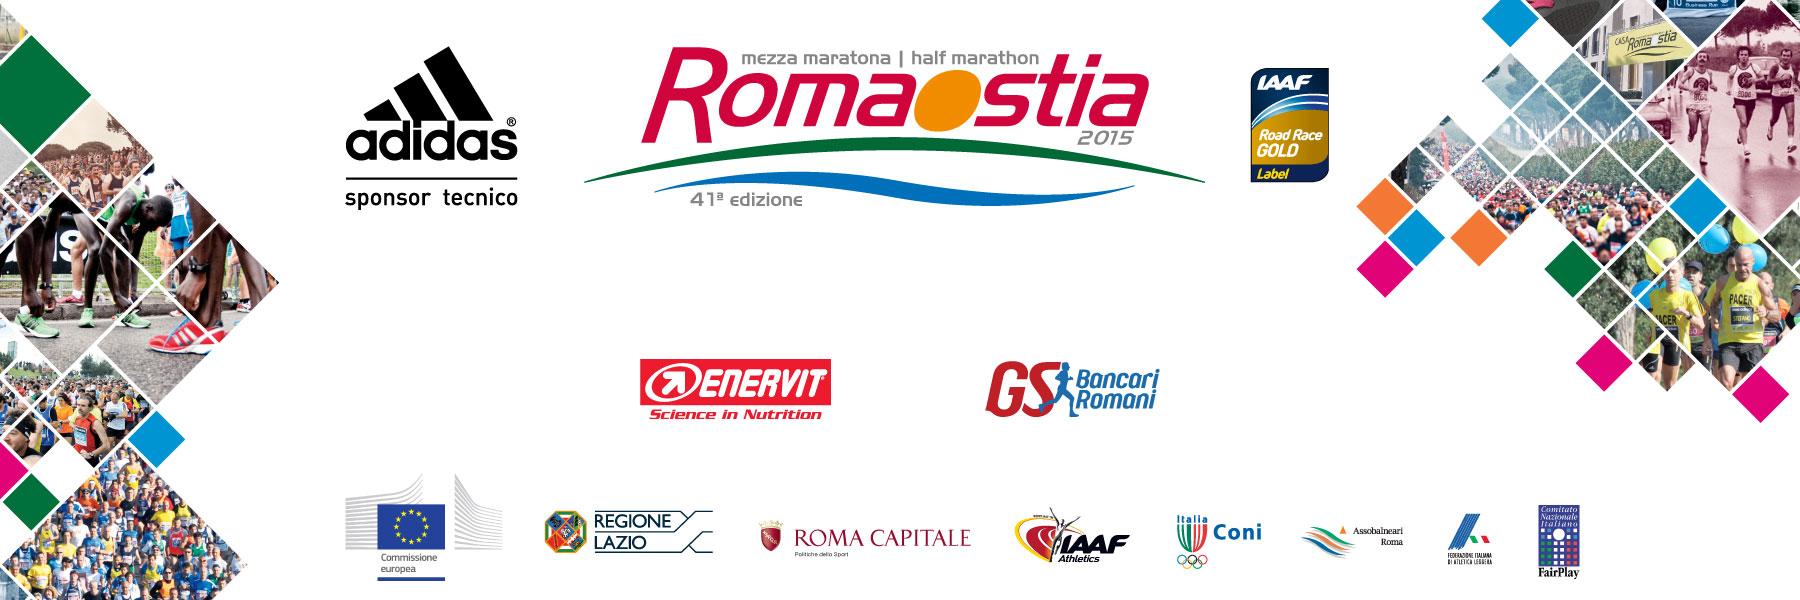 RMO015_slide_sponsor_r2